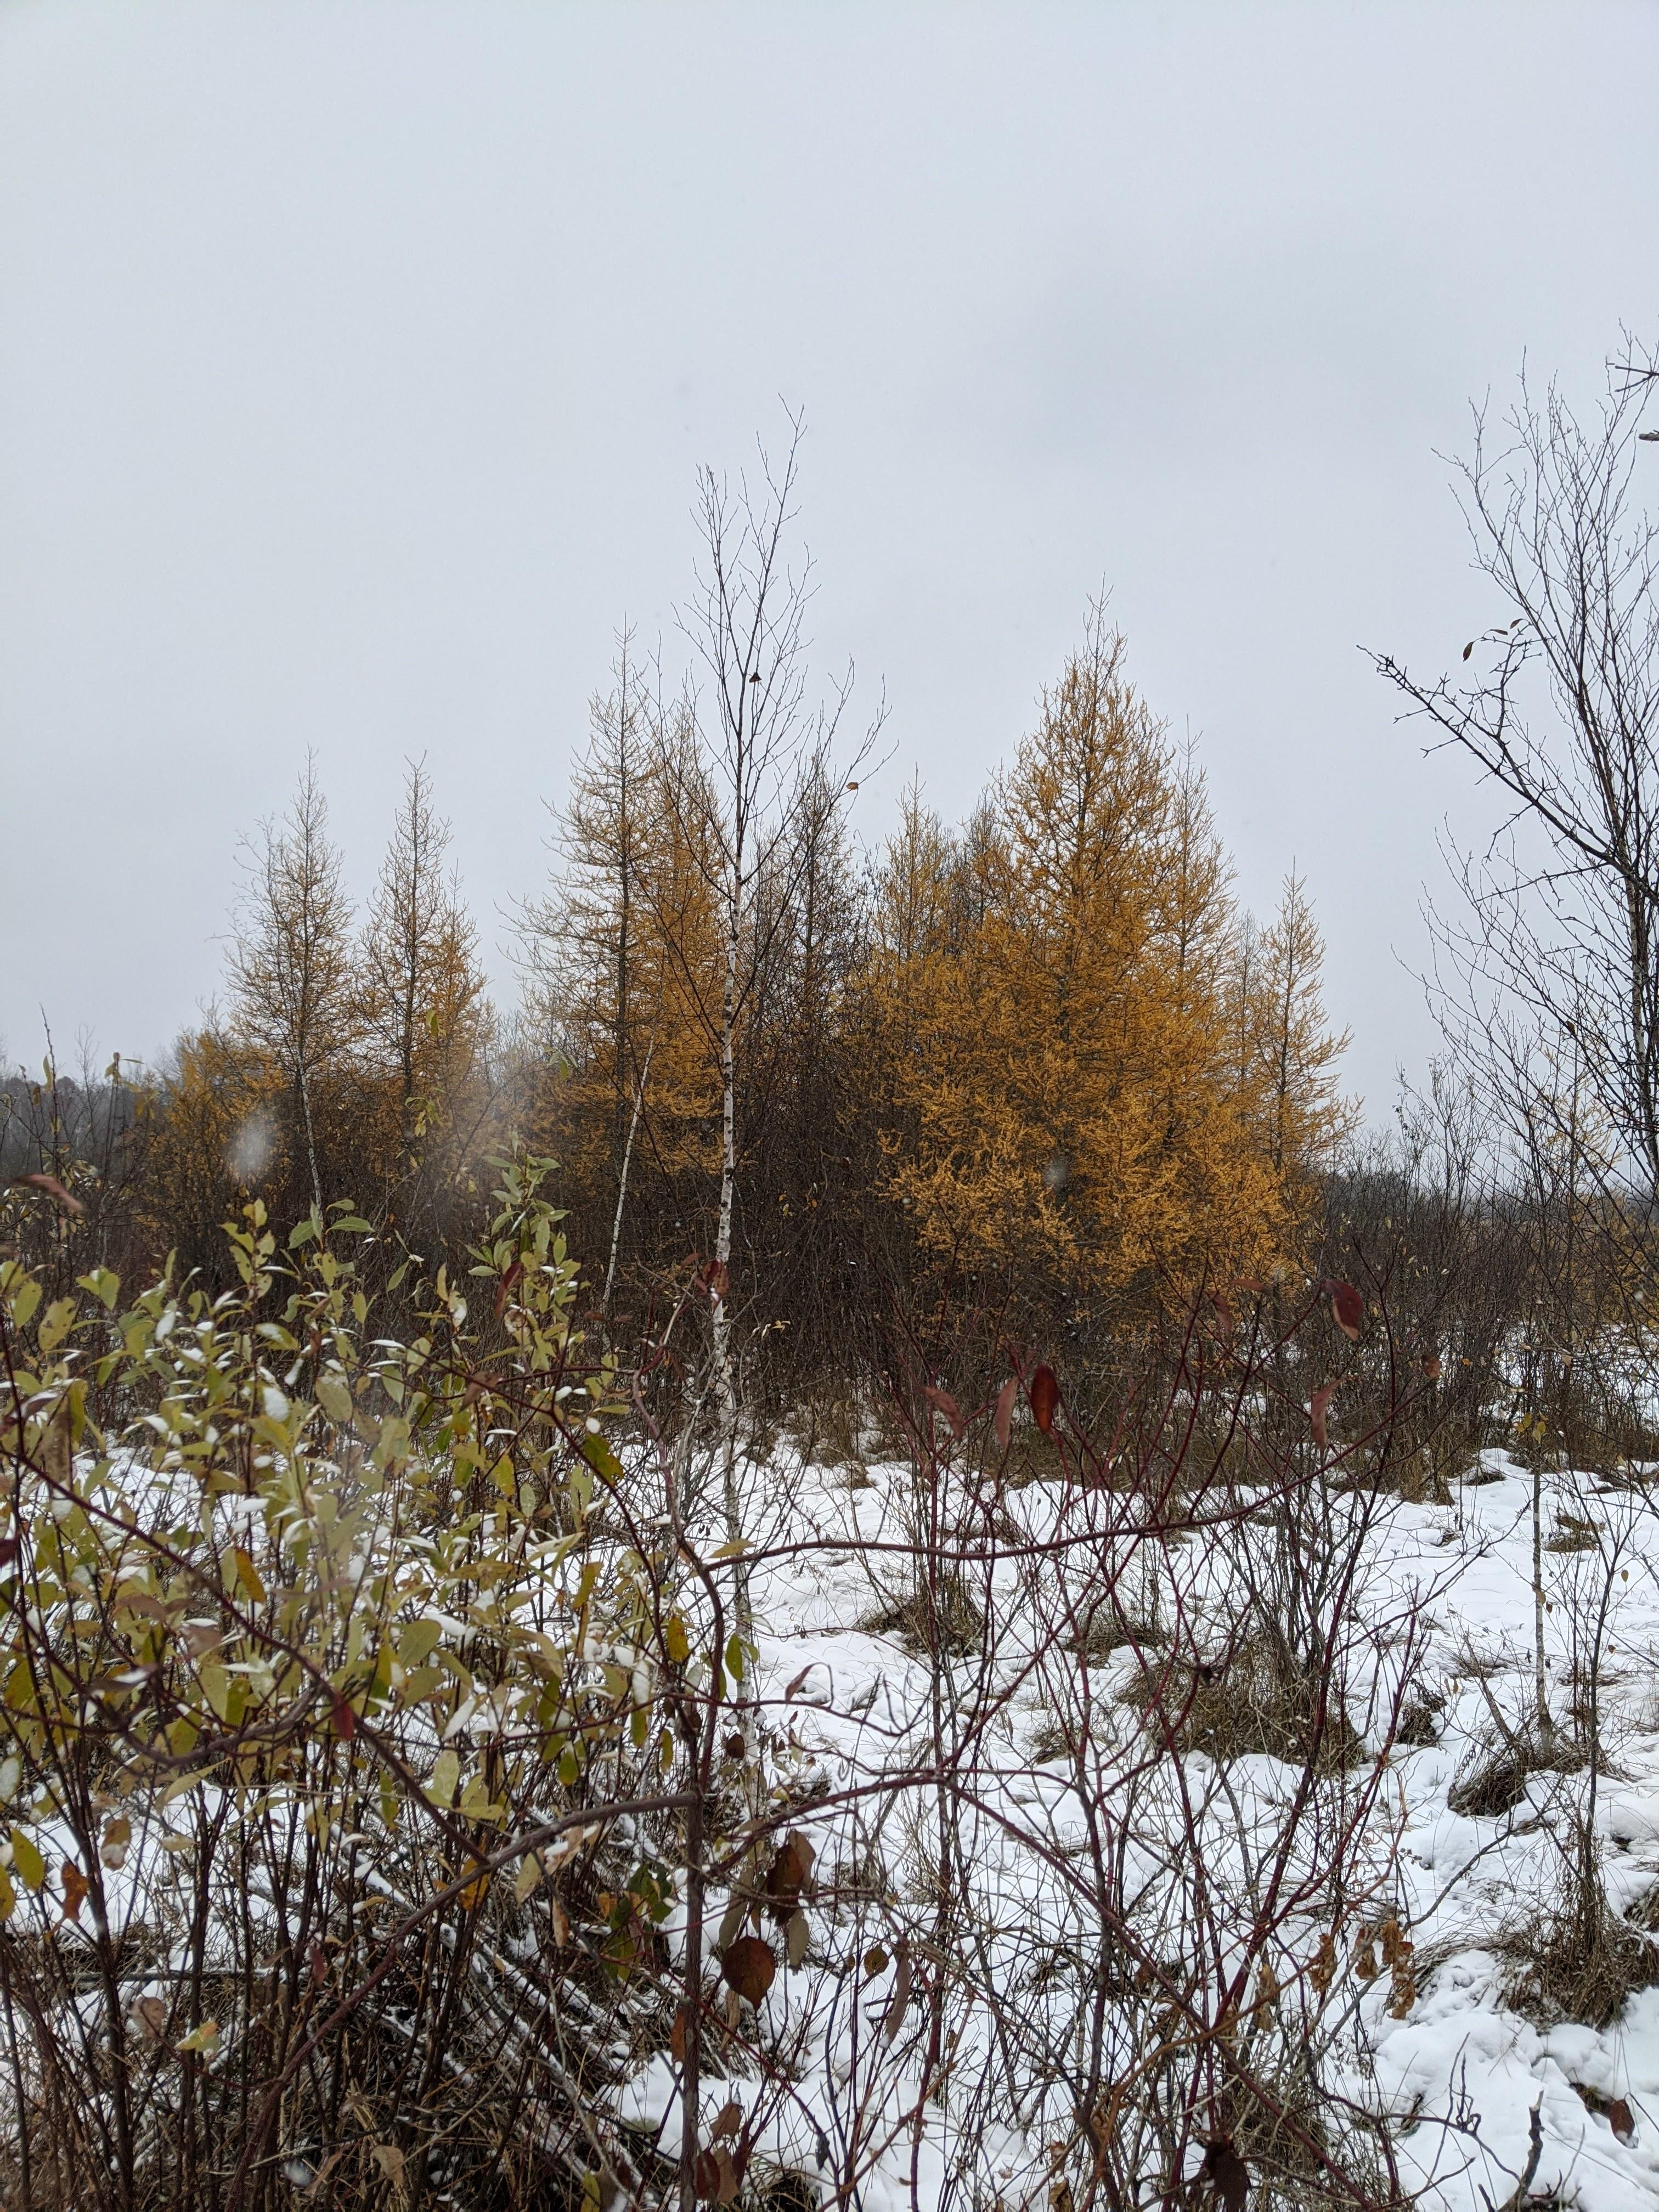 Golden tamarack trees